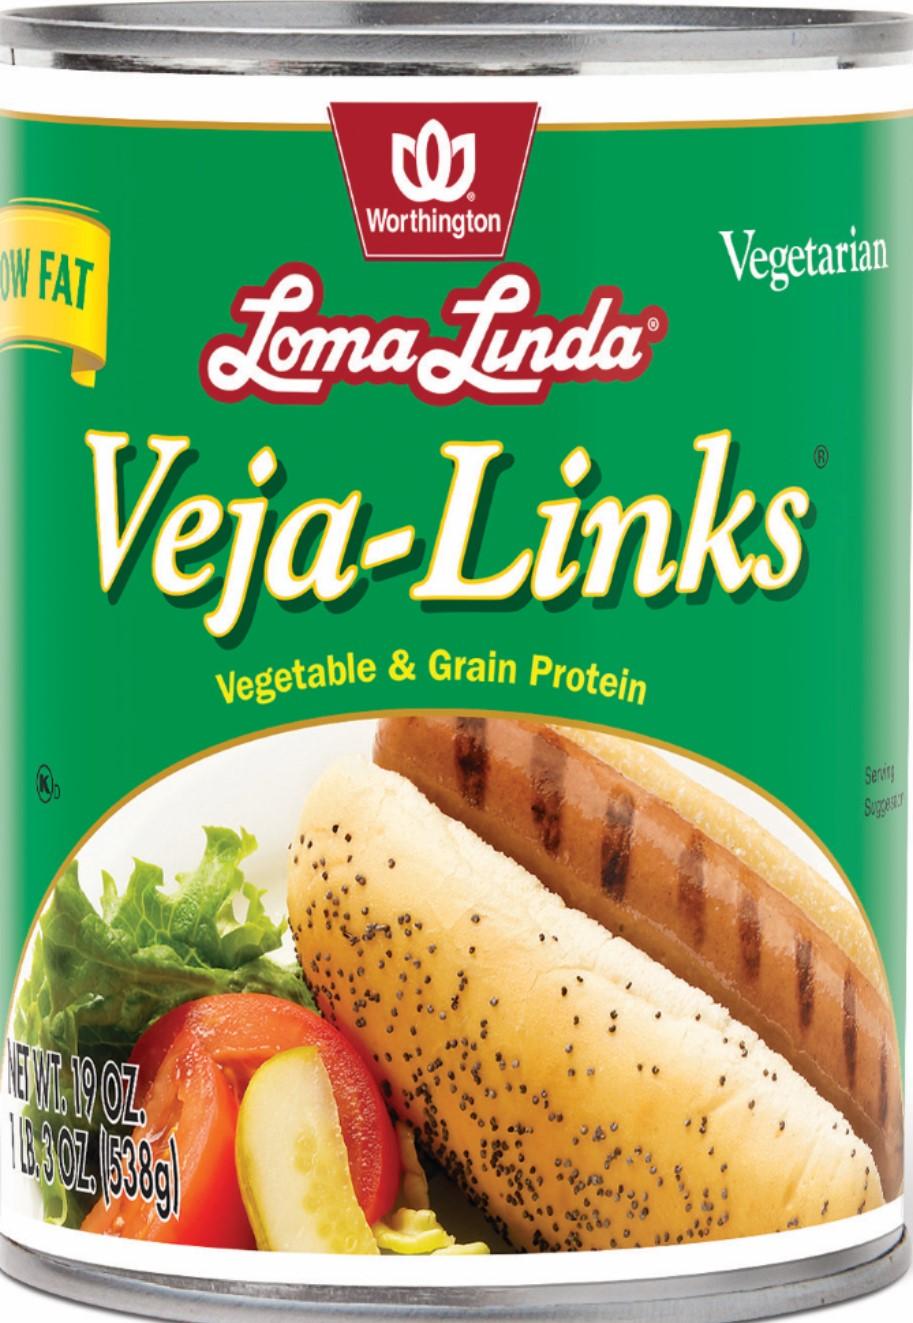 VEJA LINKS LOW FAT CASE,WORTHINGTON LF,100074